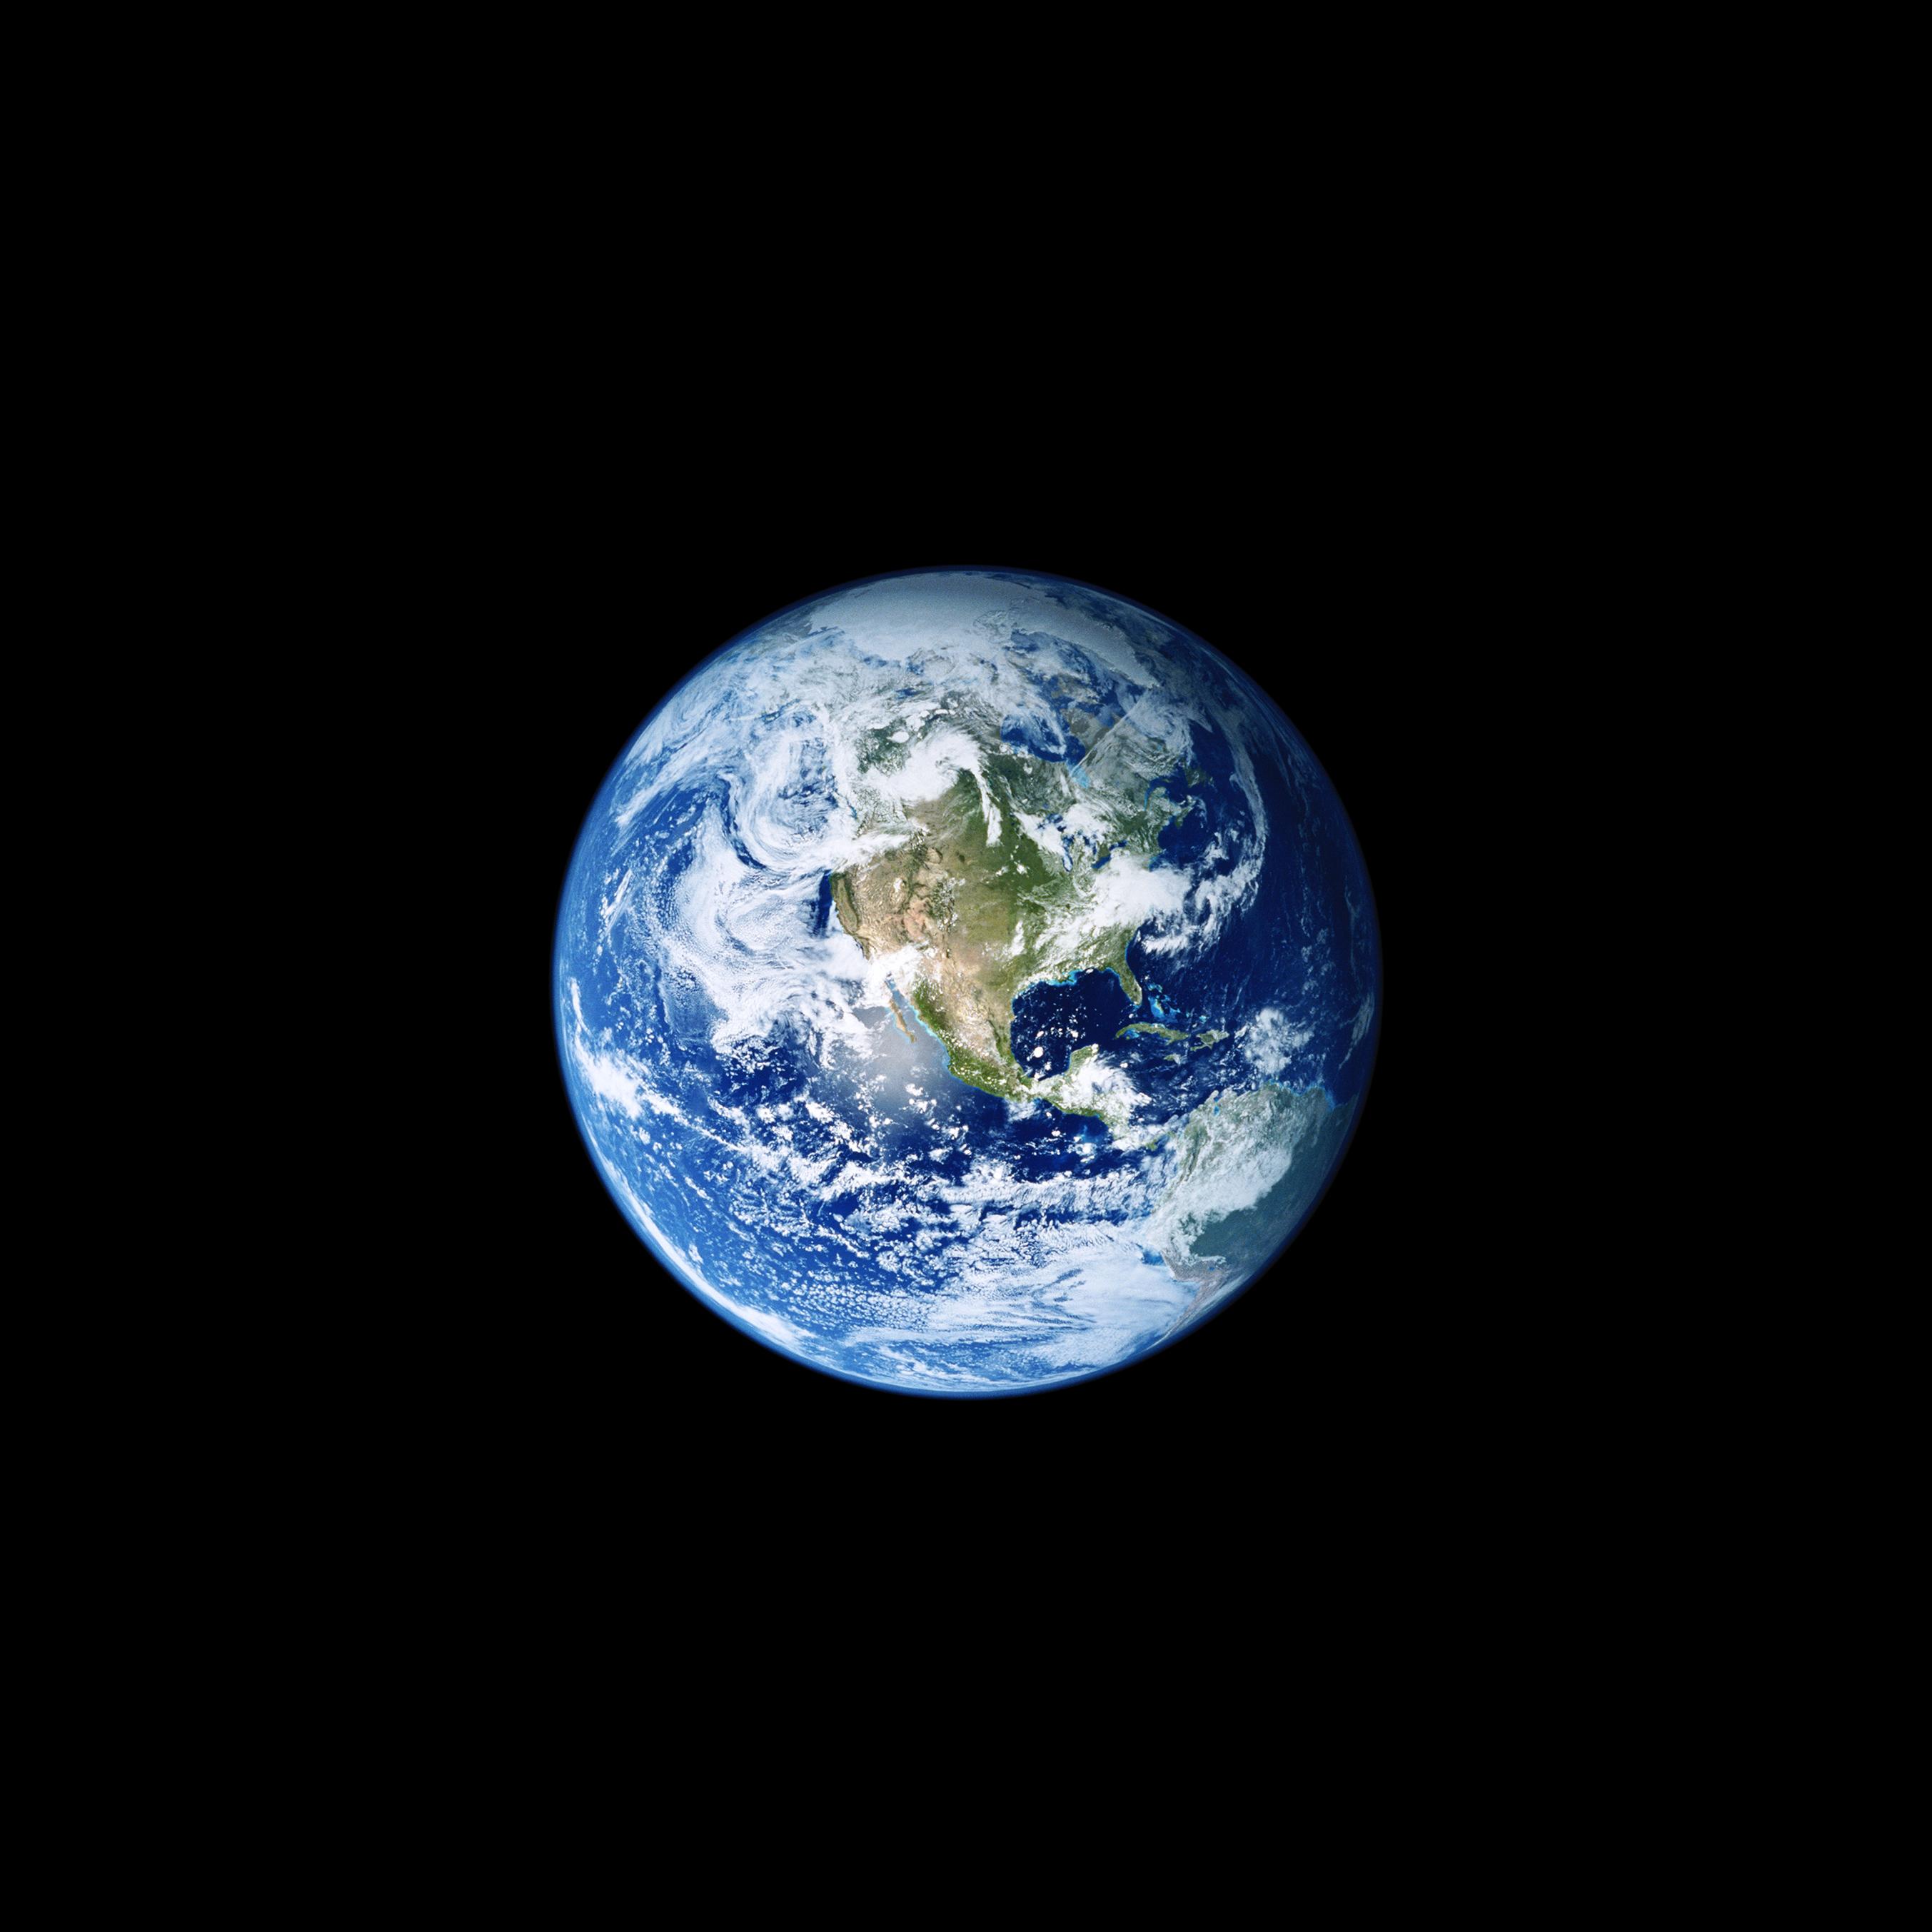 Earth iOS 11 GM iPhone wallpapers - Trọn bộ hình nền mới của iOS 11